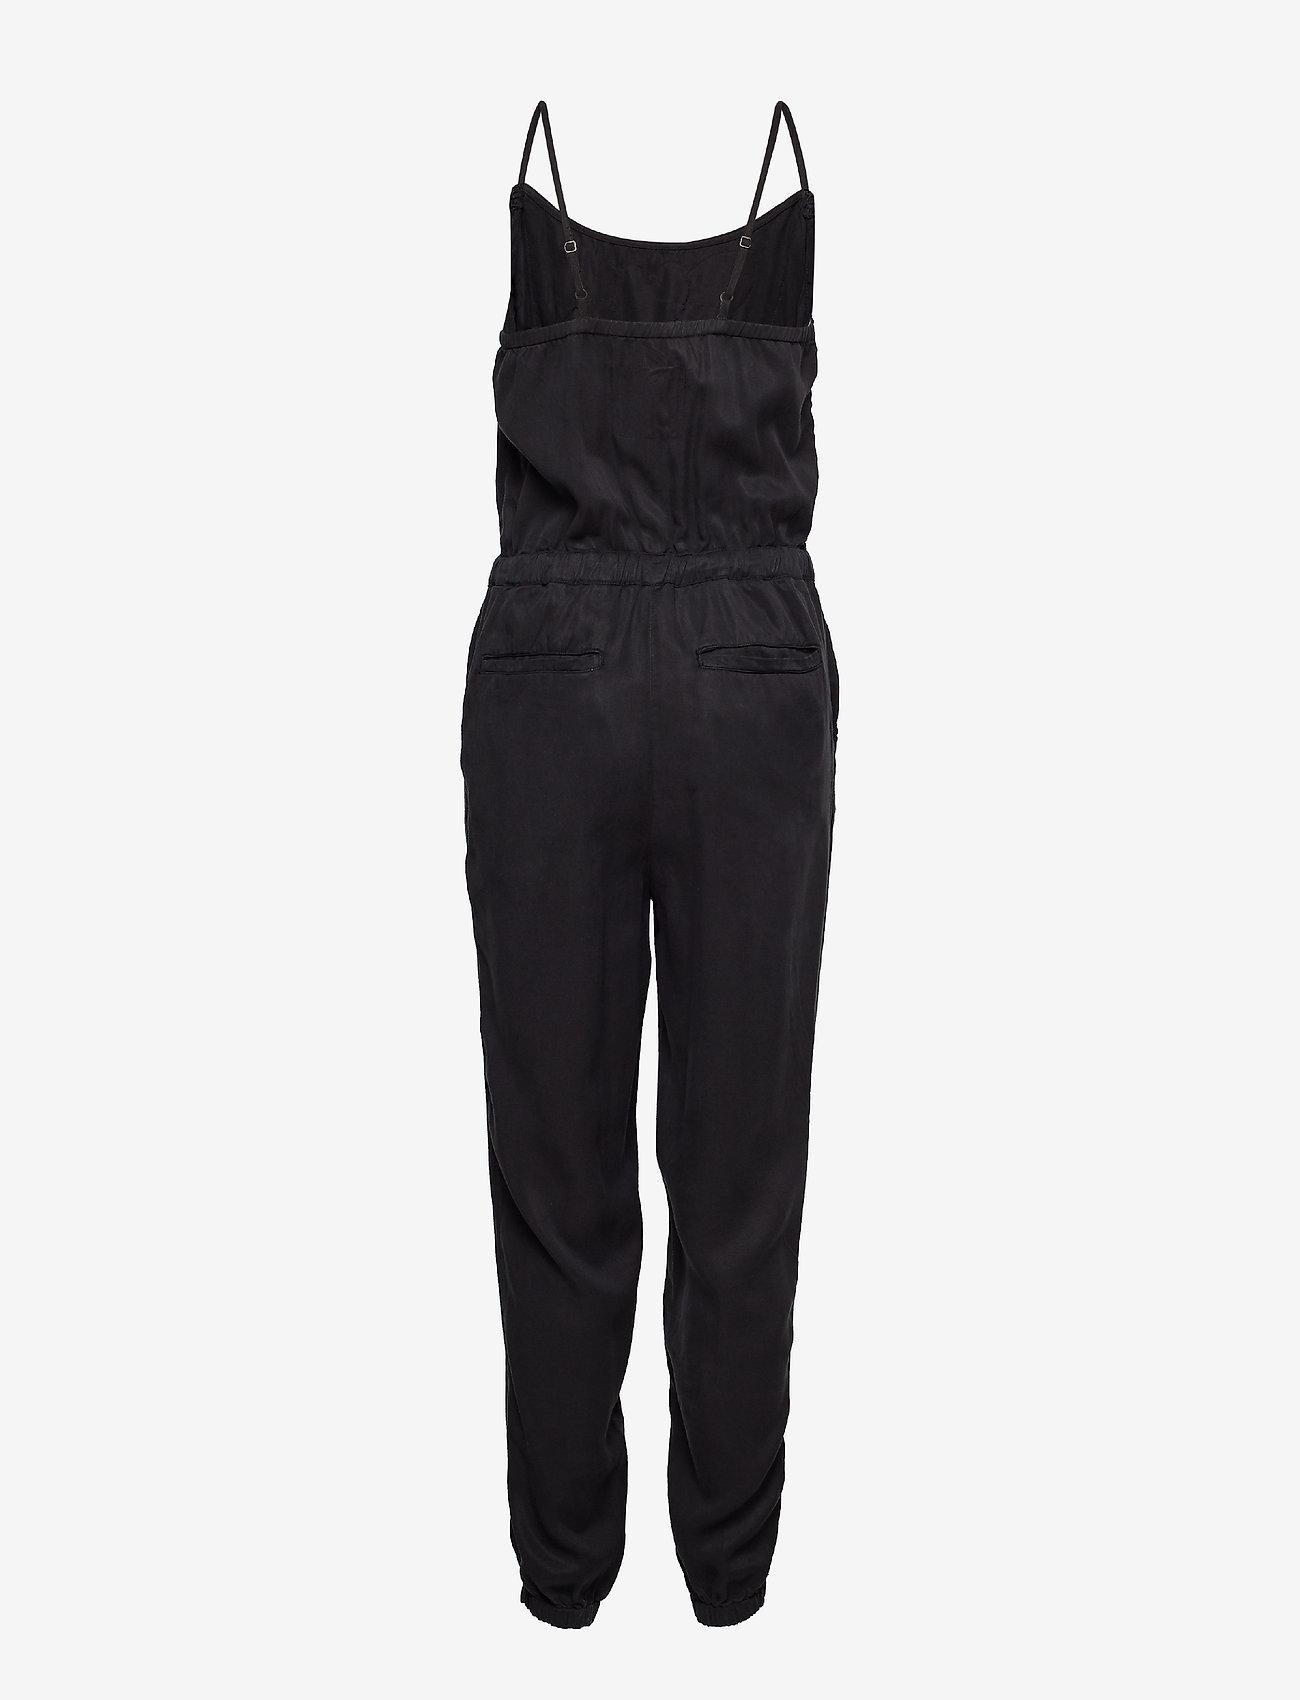 Superdry Reah Boho Jumpsuit - Jumpsuits Washed Black